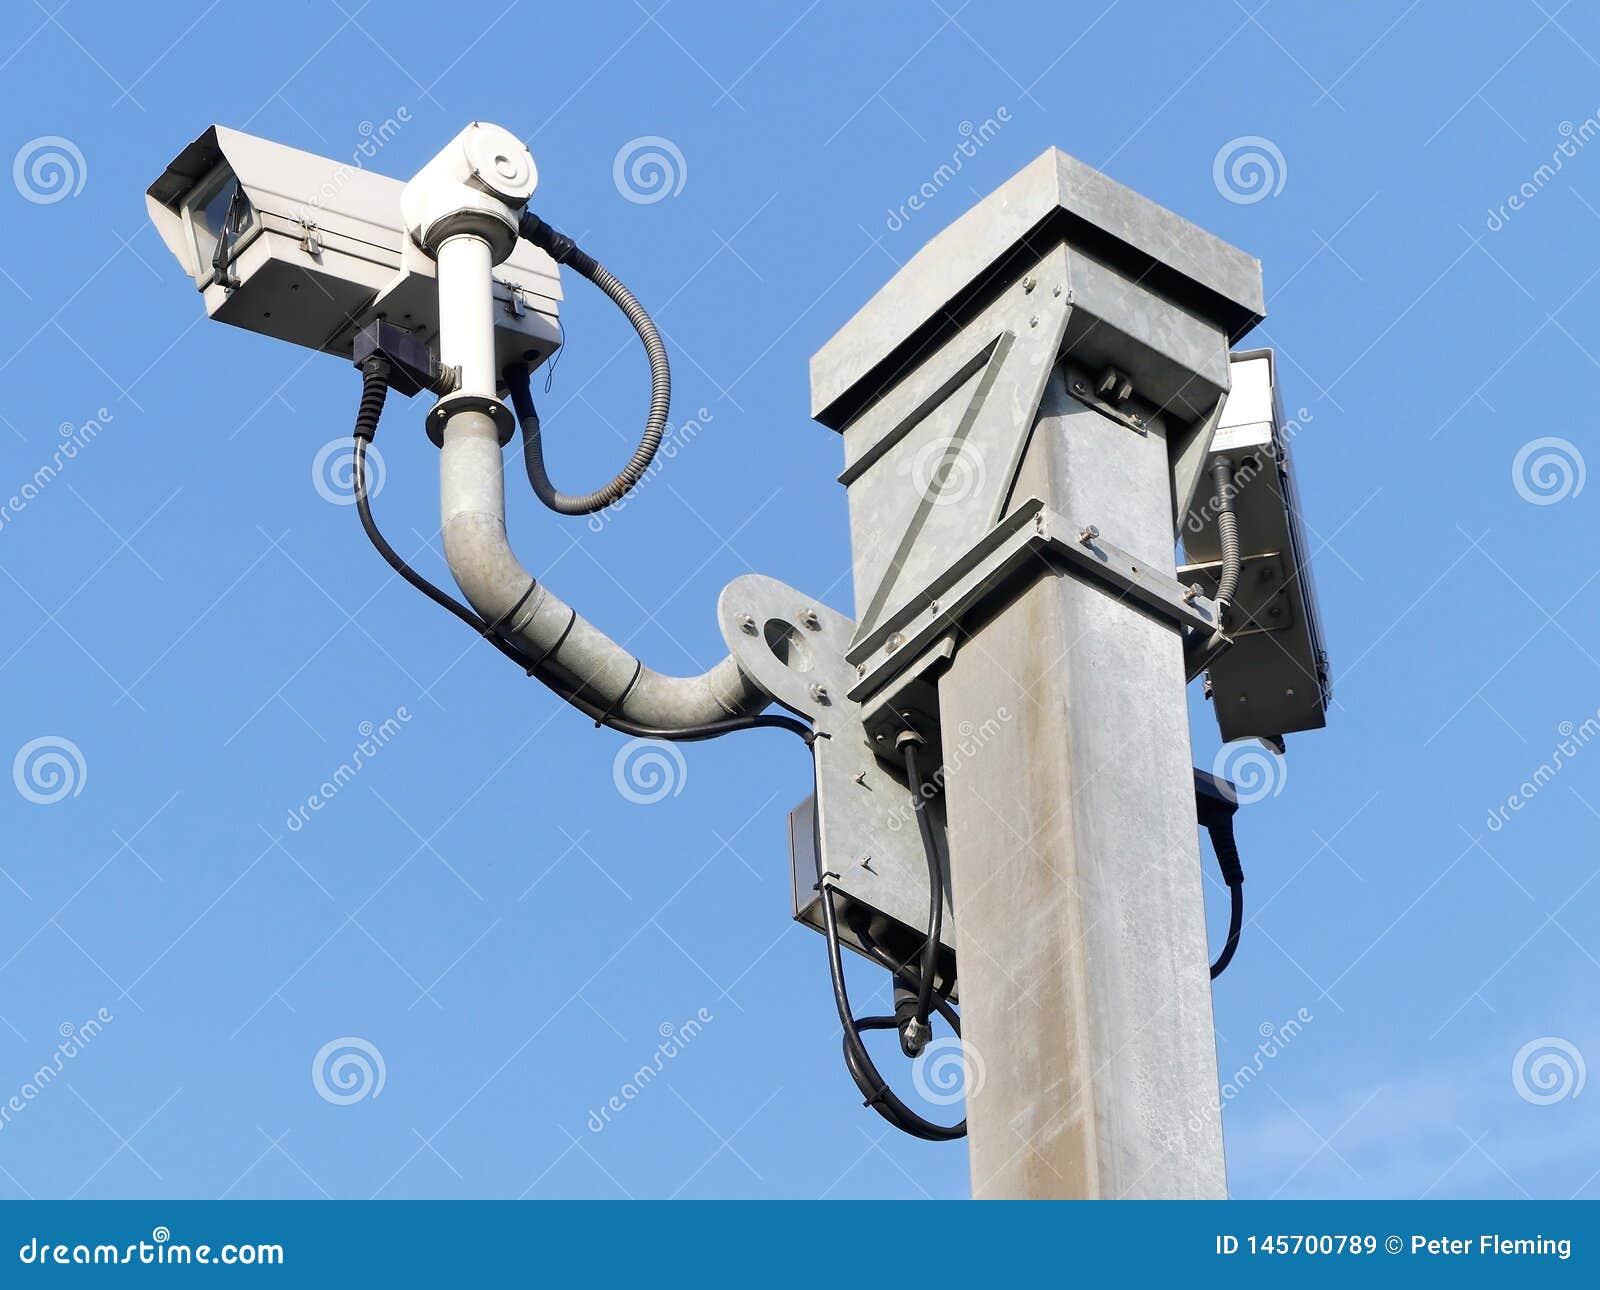 Surveillance cameras monitoring motorway traffic on the M25 in Hertfordshire